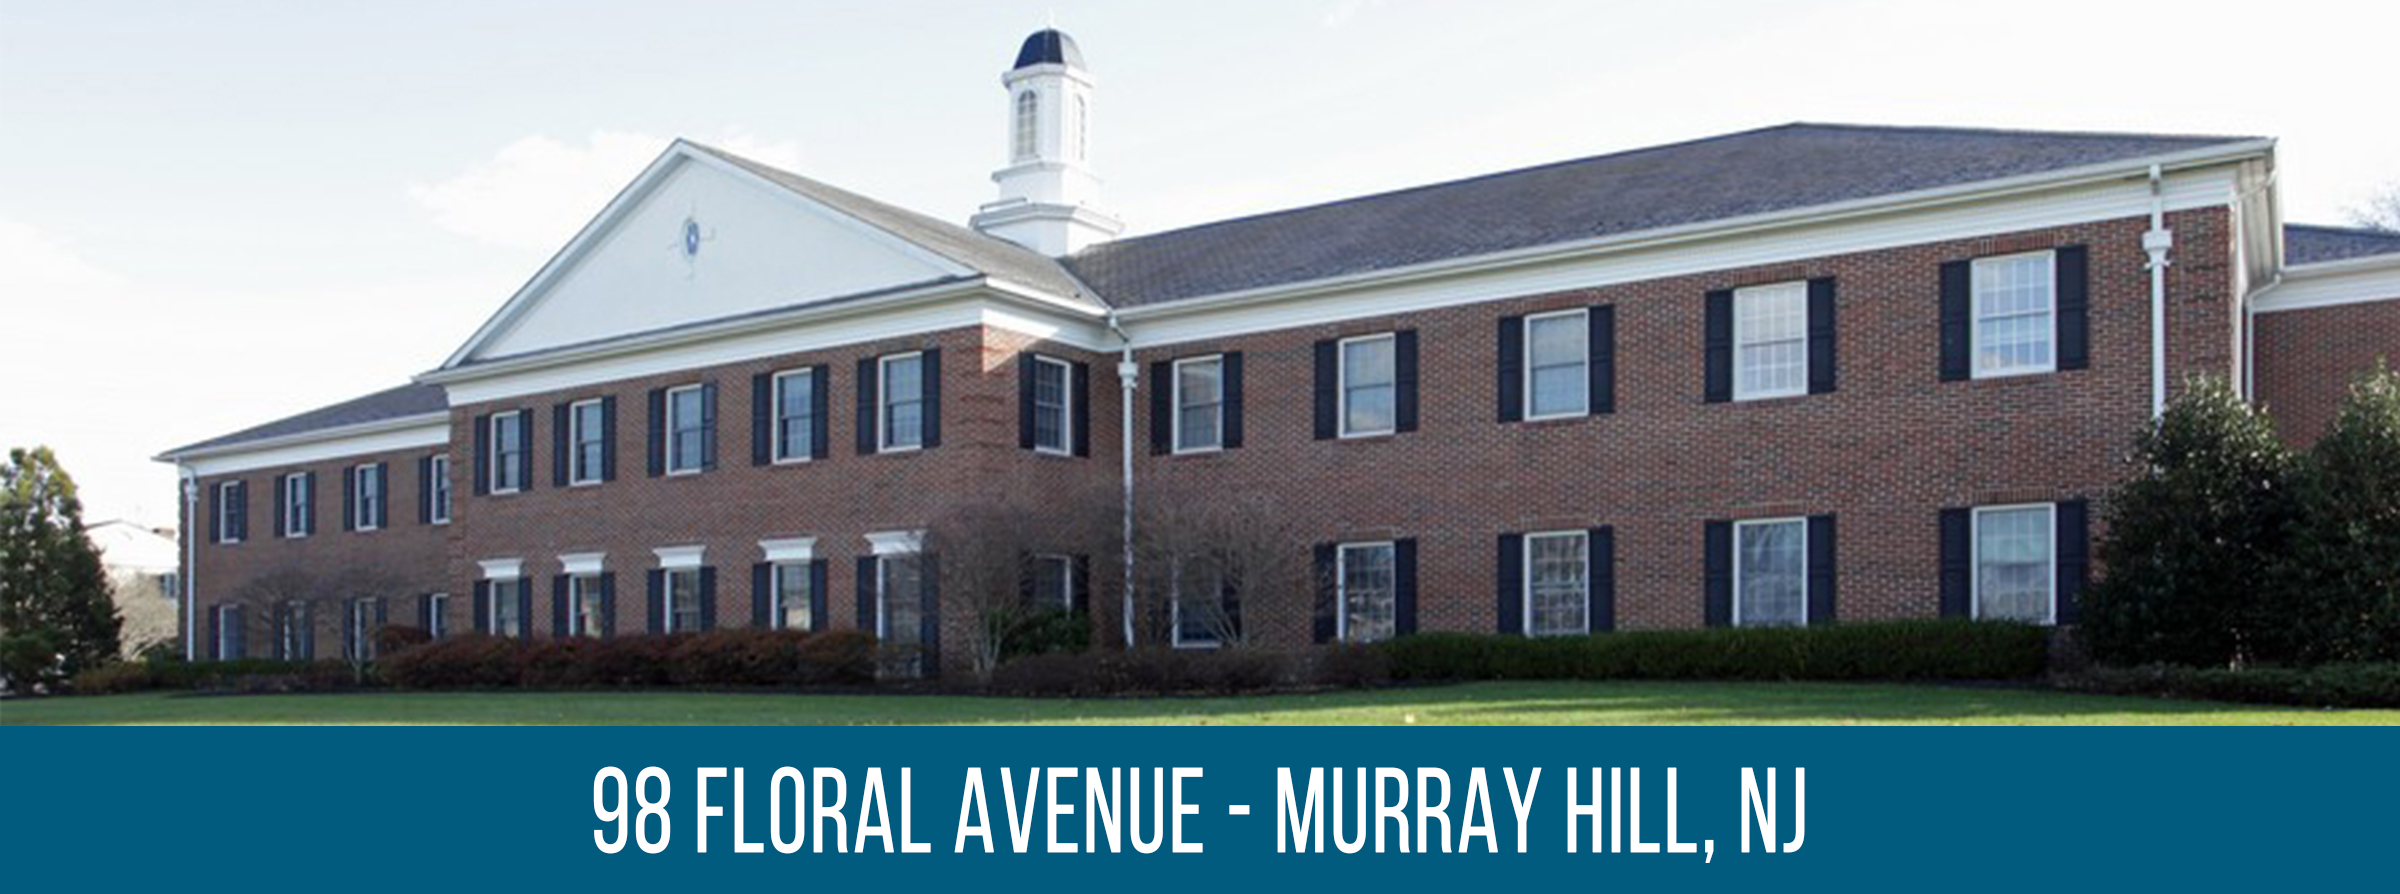 98 Floral Avenue - Murray Hill, NJ